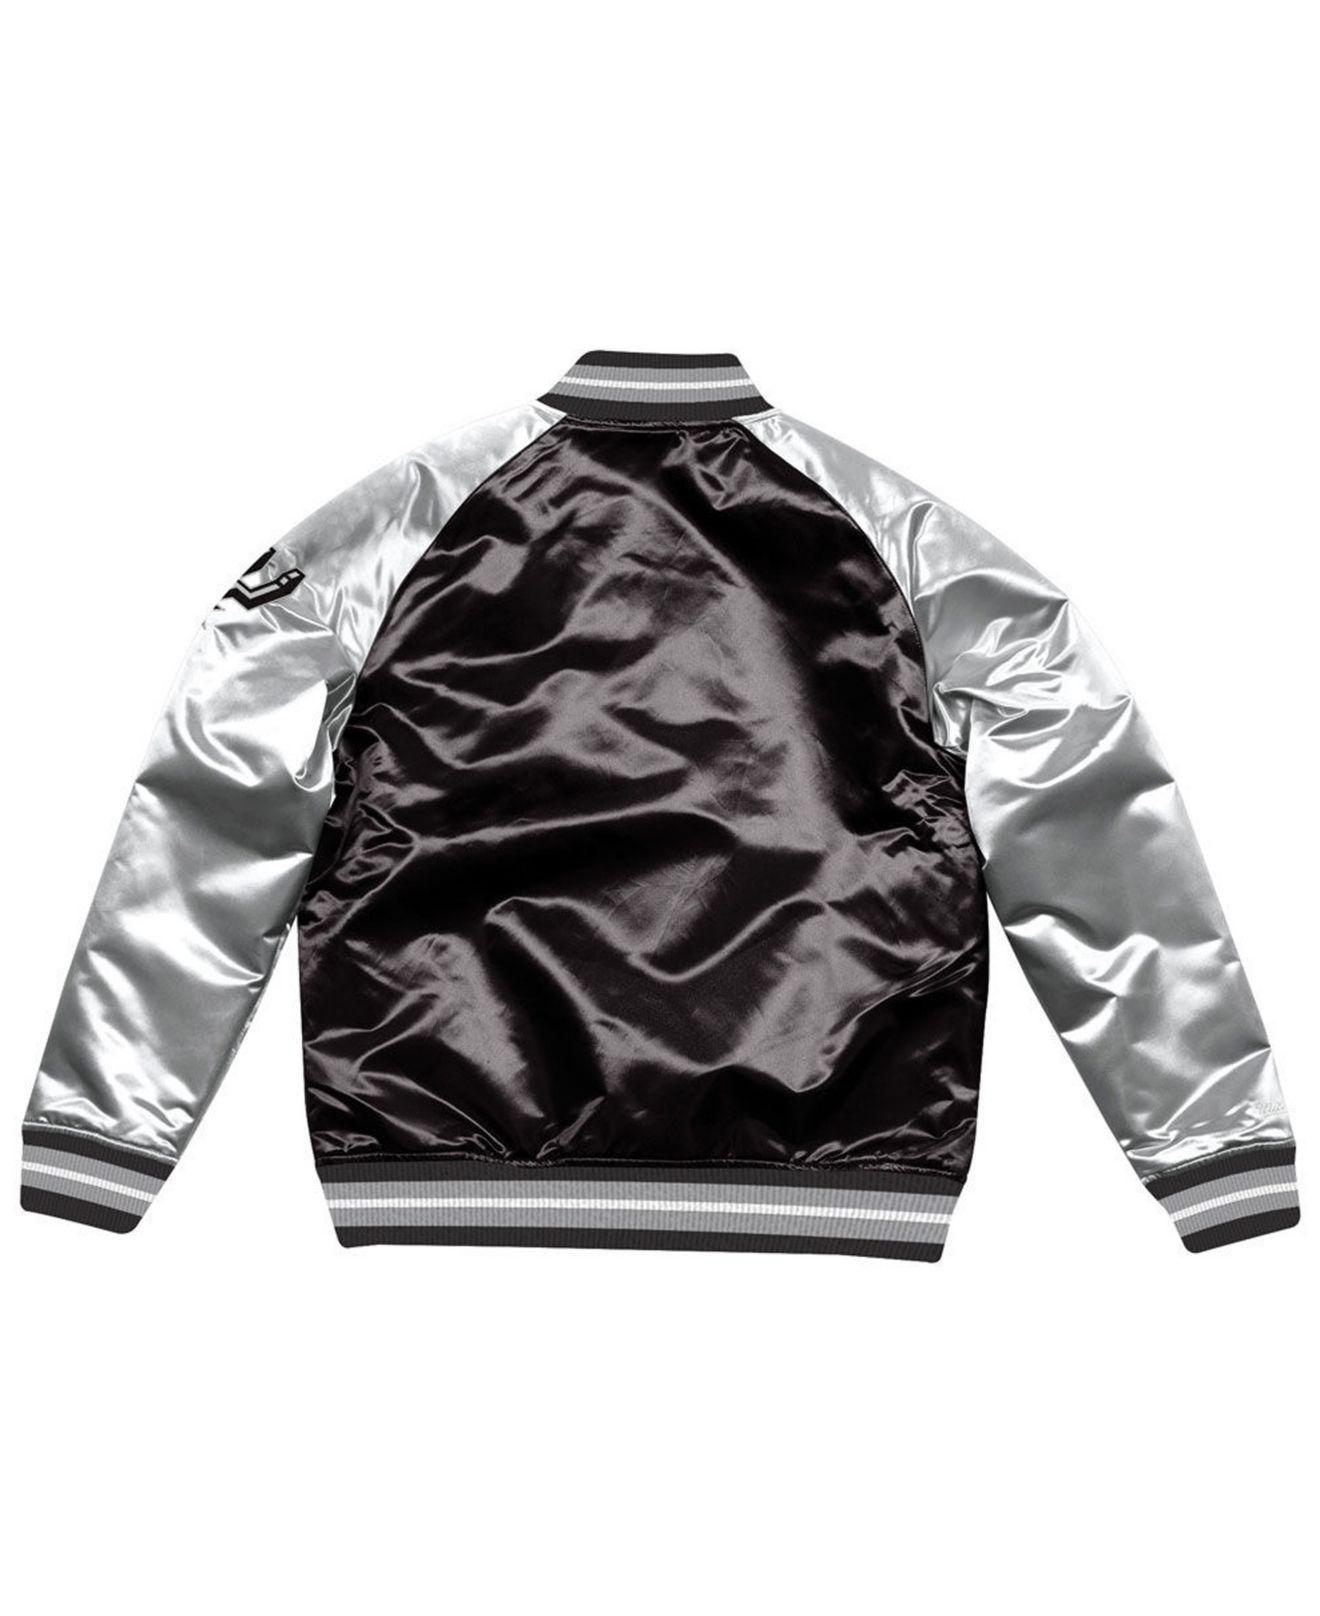 Lyst - Mitchell   Ness San Antonio Spurs Tough Season Satin Jacket in Black  for Men 475b6a968